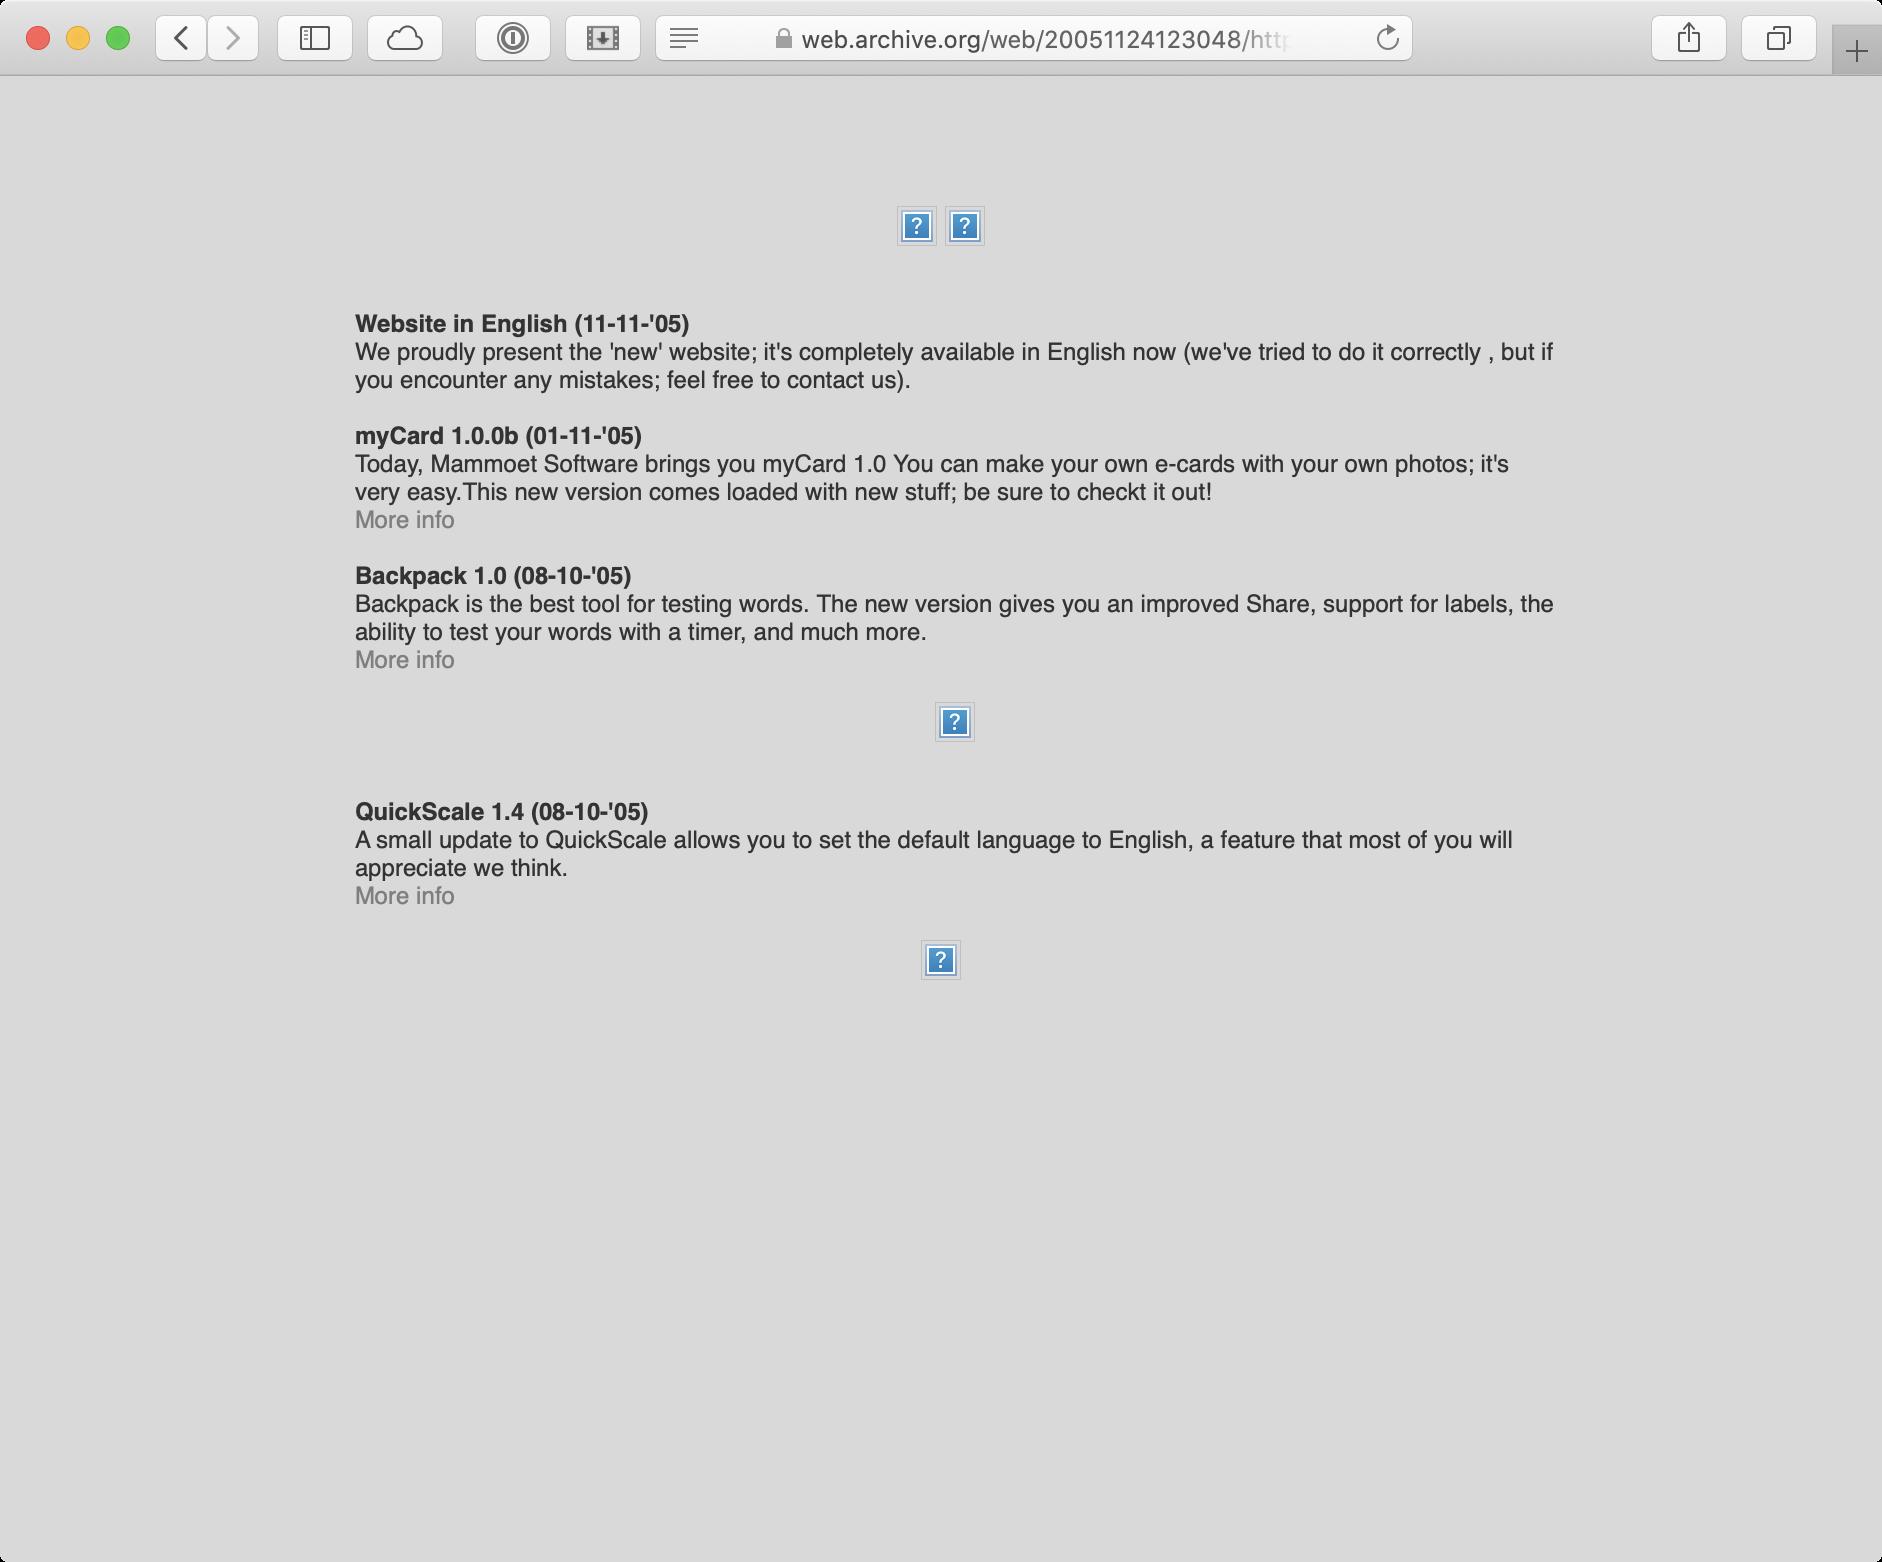 Initial website Mammoet Software 2005